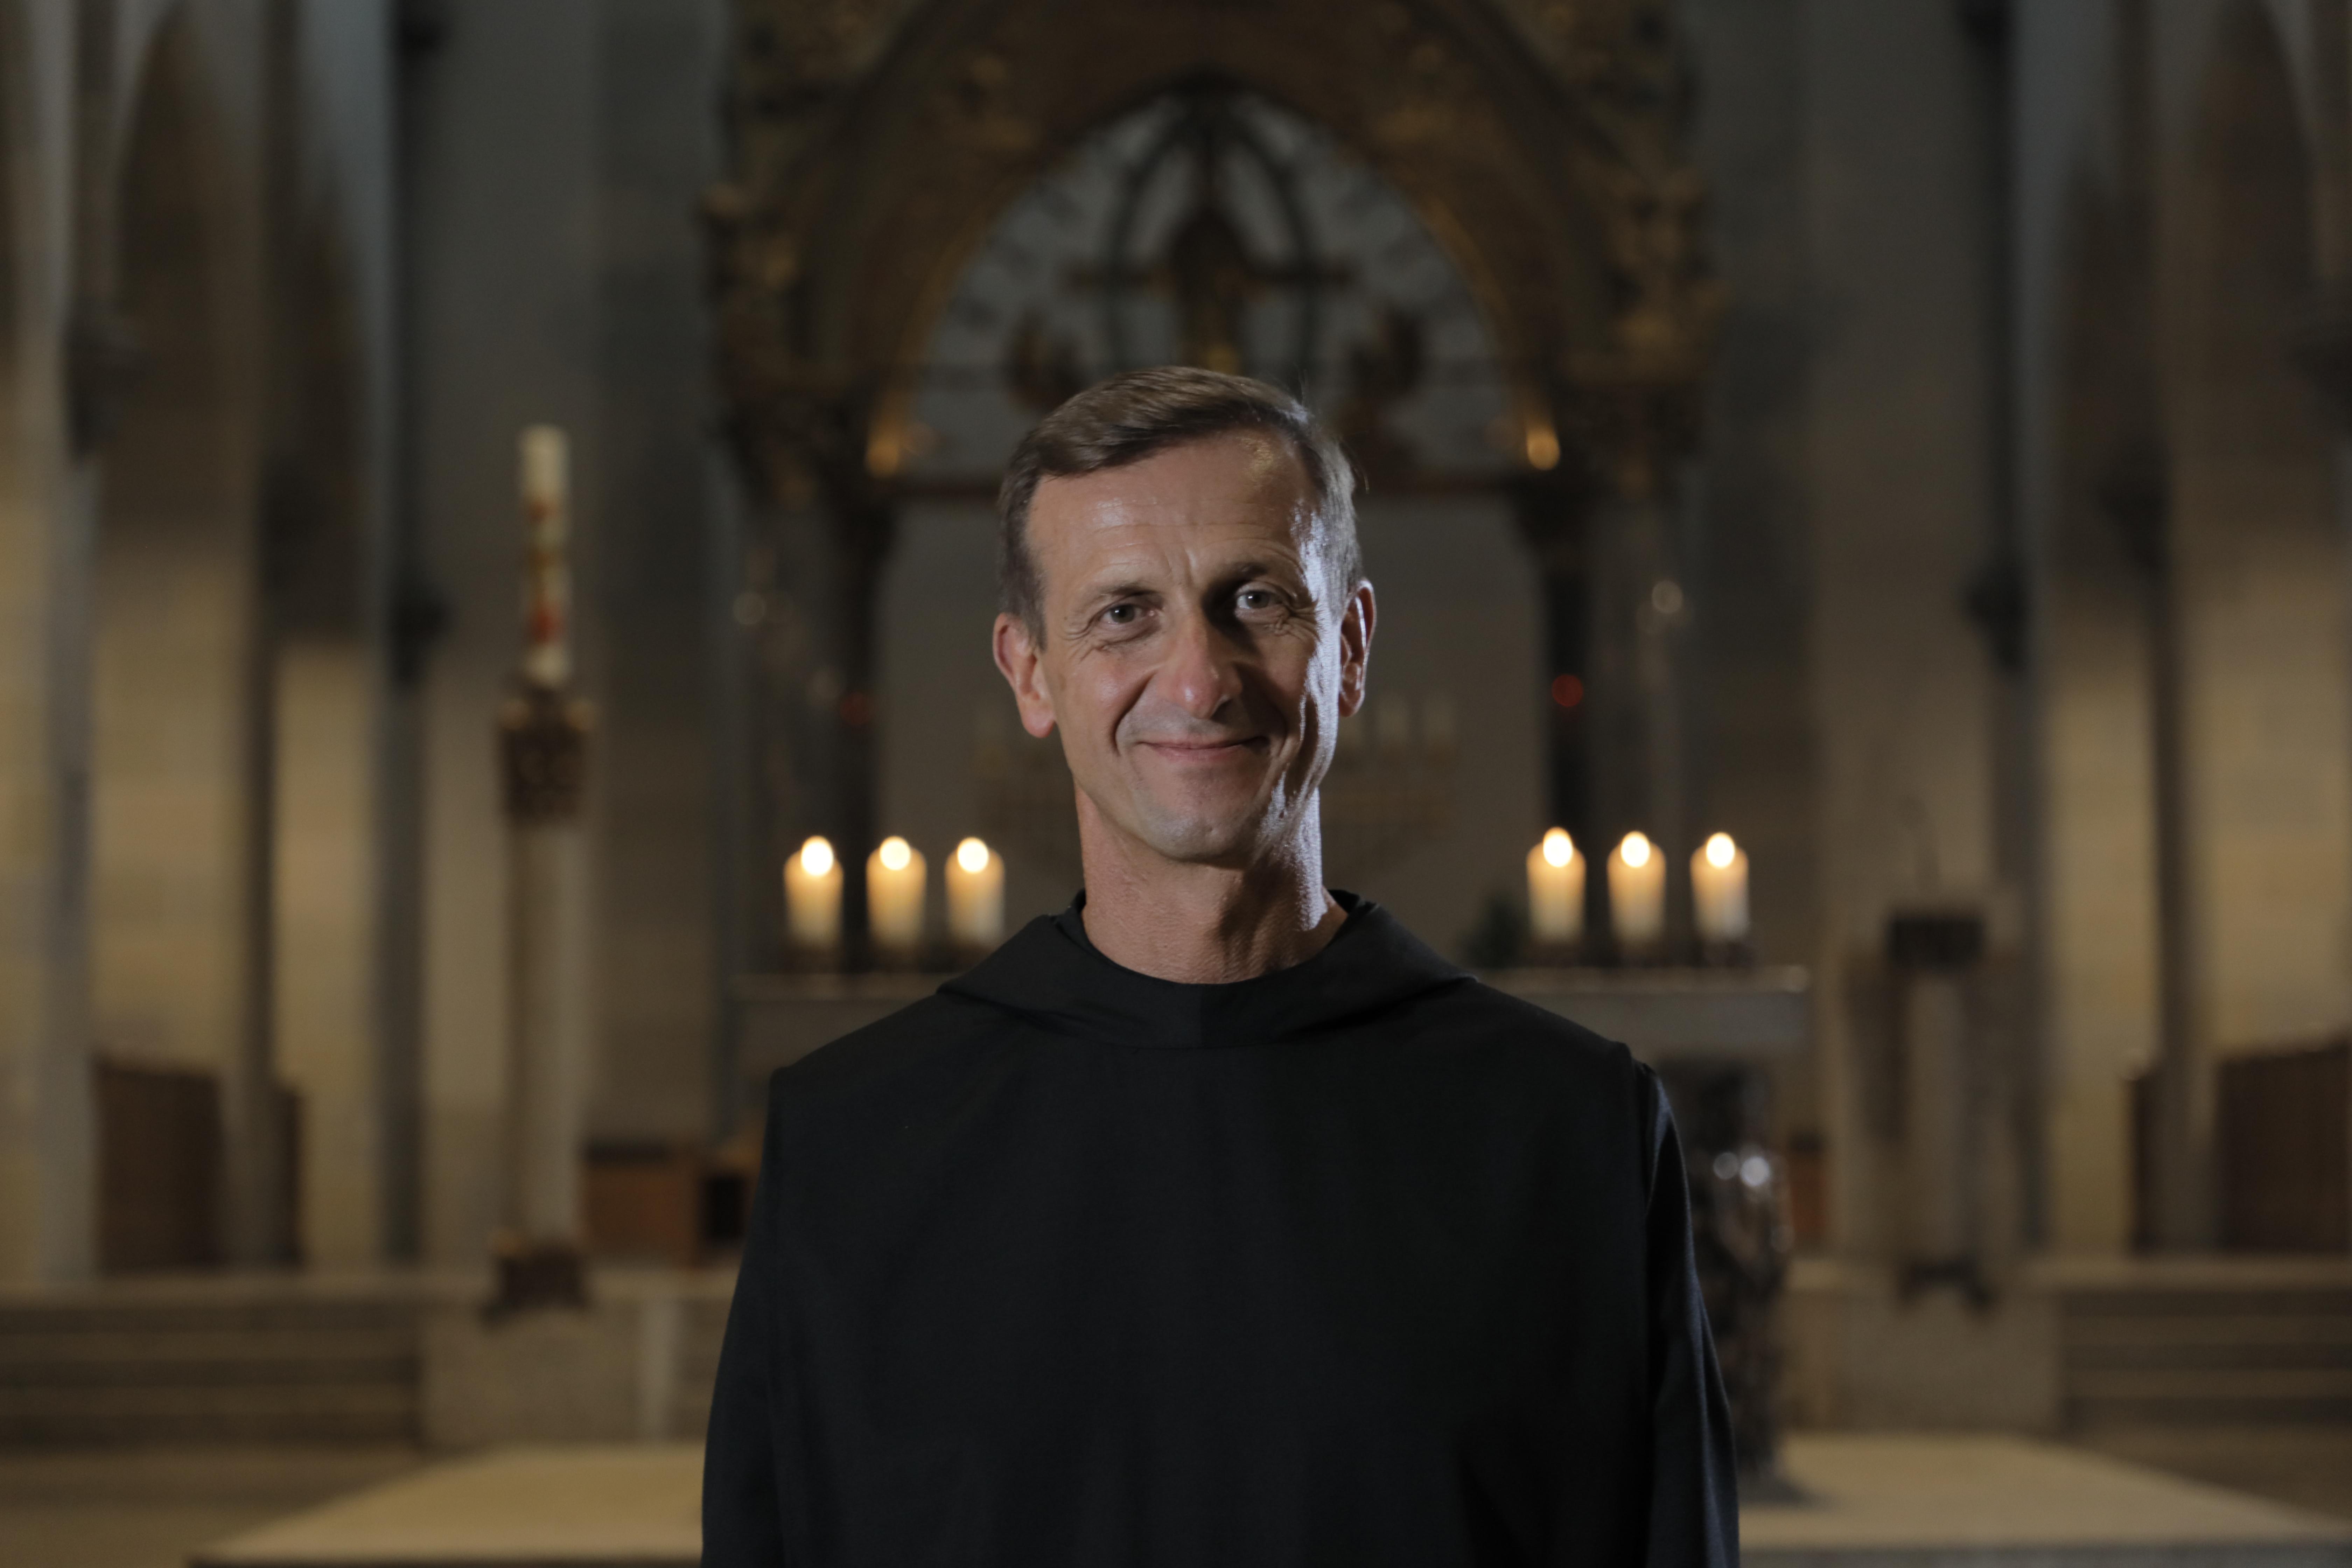 <strong>Benediktiner Pater Vianney Meister</strong>